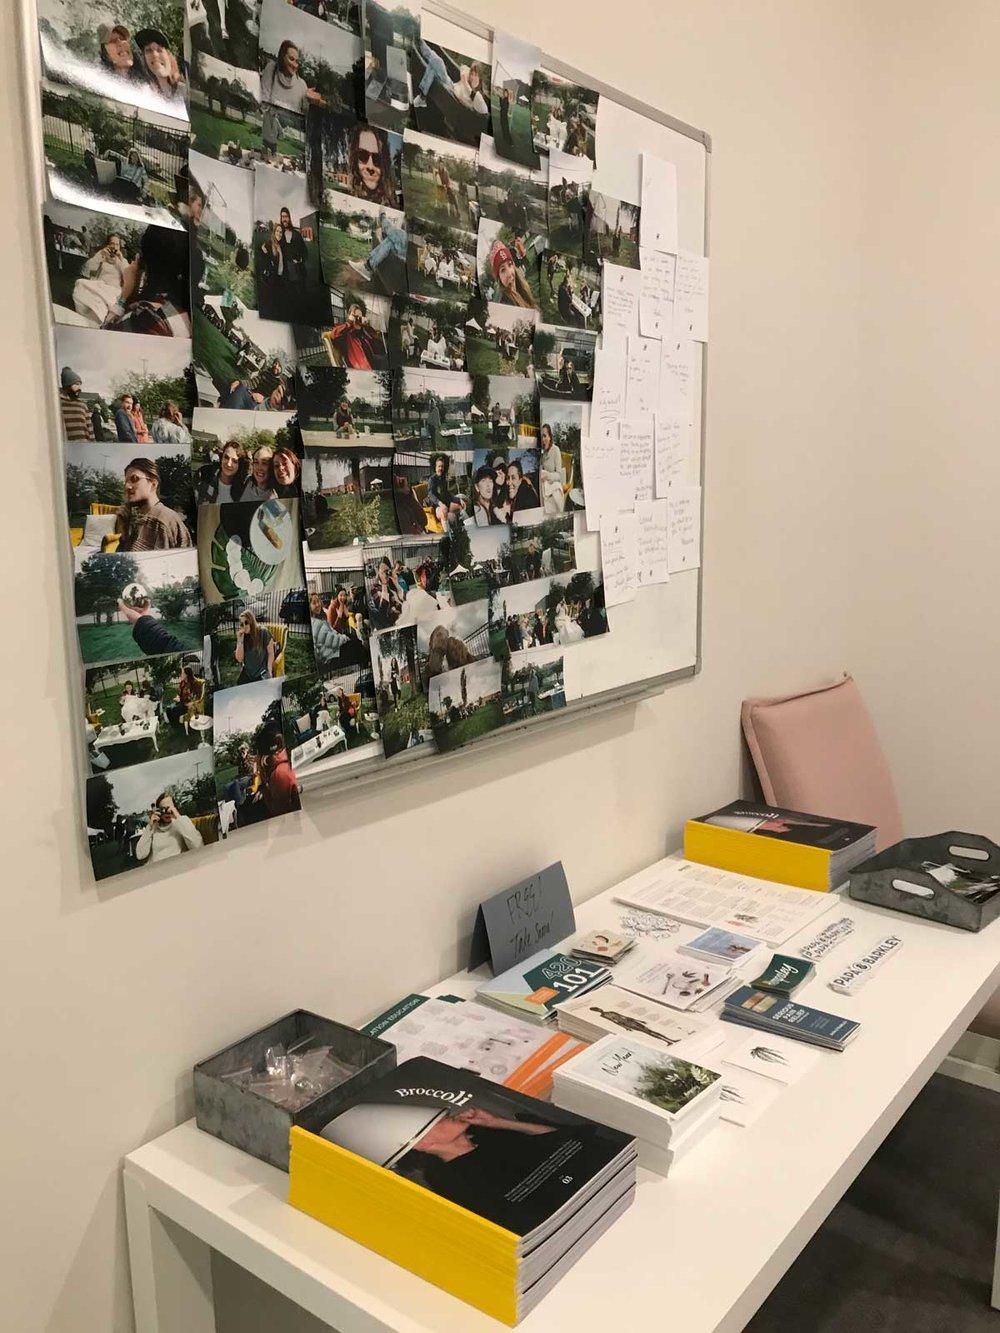 hempsley-missouri-cbd-education-events